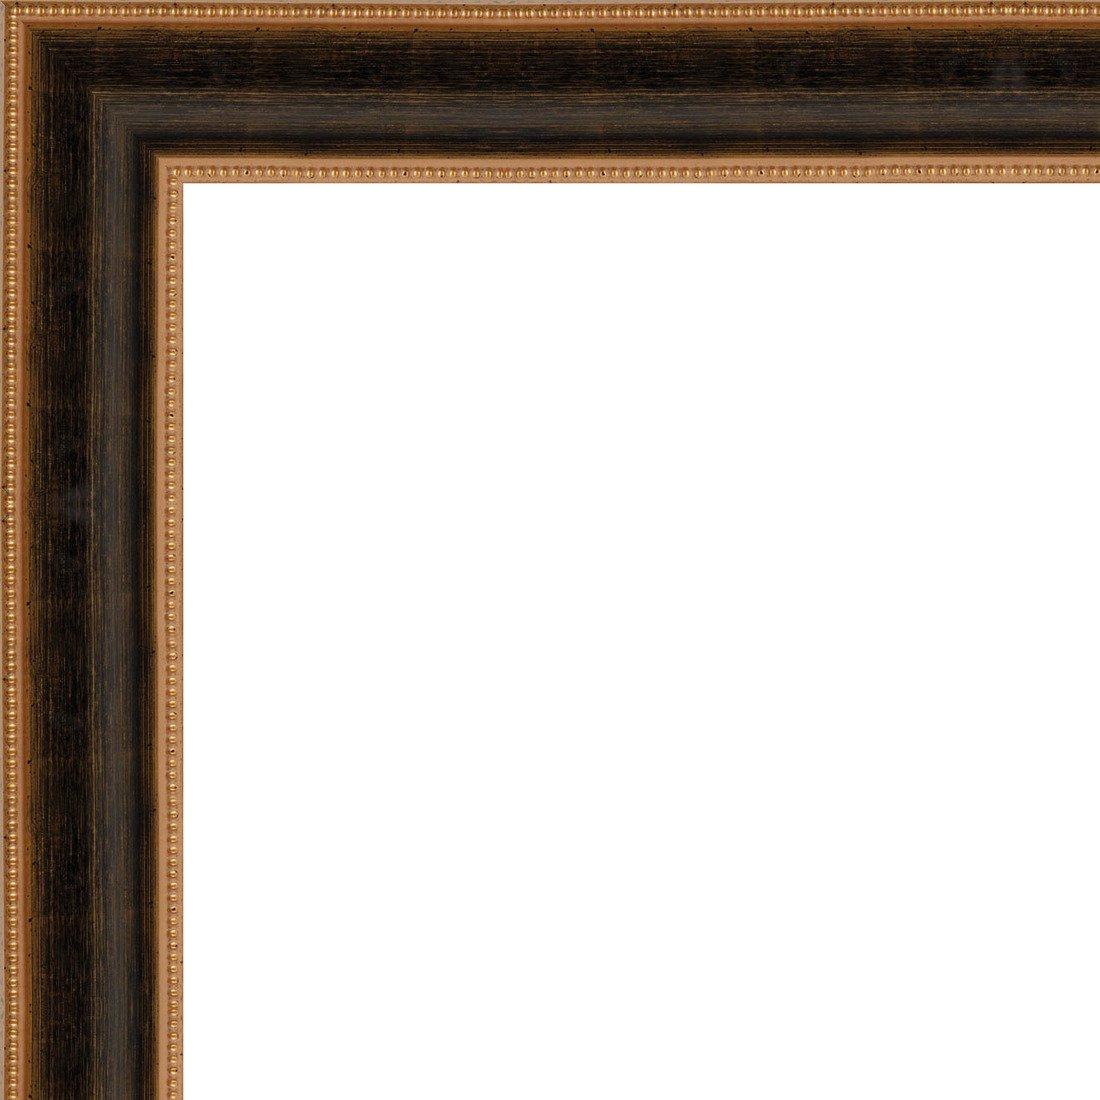 Picture Frame Moulding (Wood) 18ft bundle - Traditional Antique Gold Finish - 3.25'' width - 5/8'' rabbet depth by CustomPictureFrames